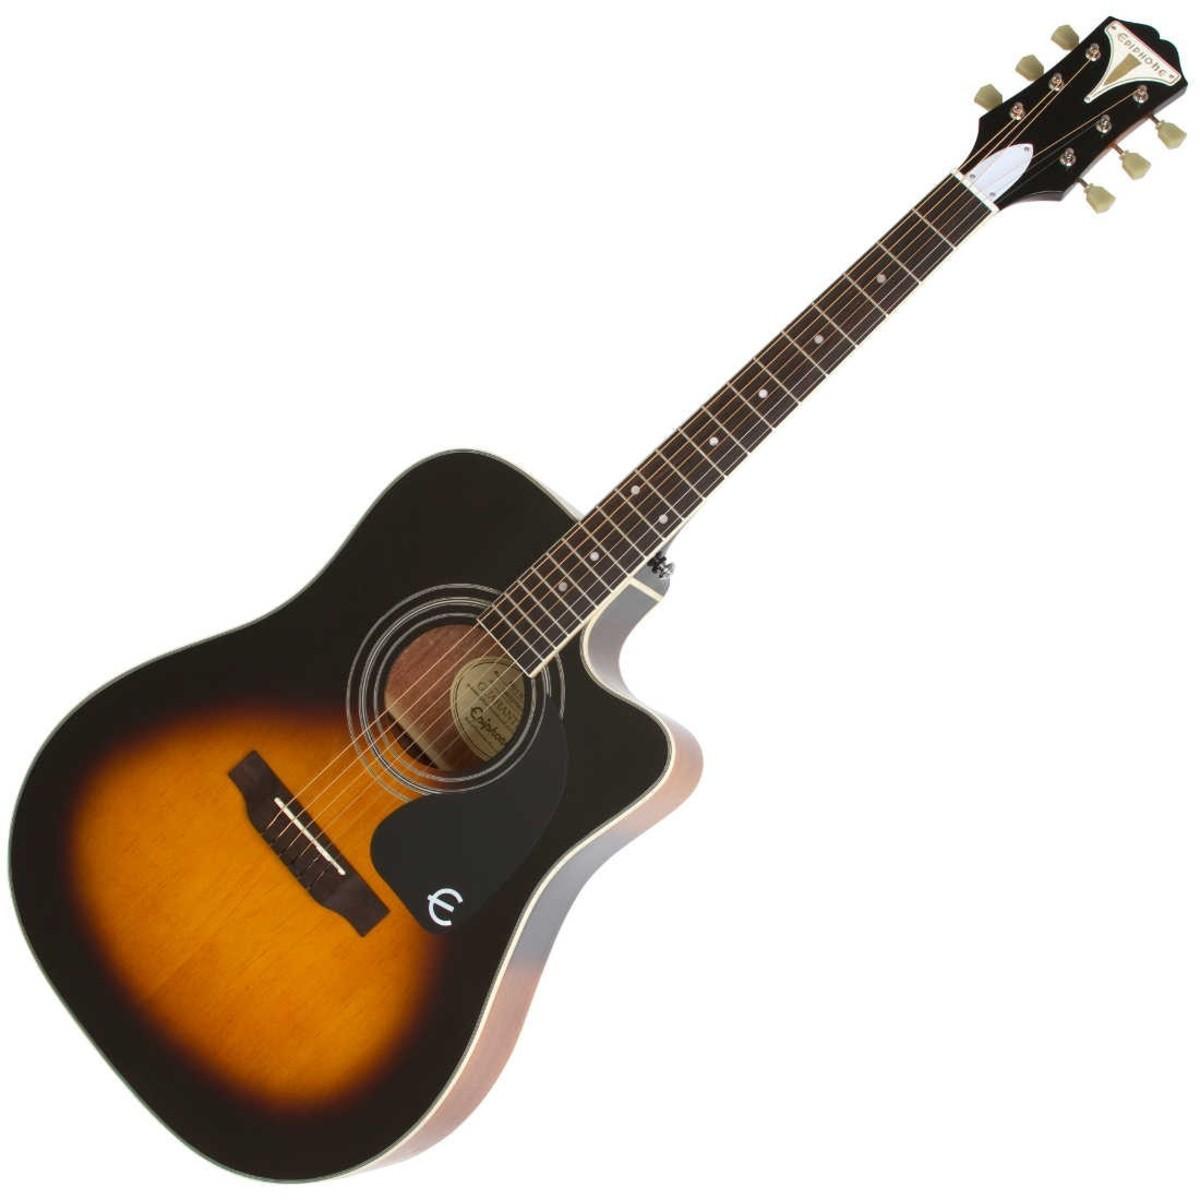 epiphone pro 1 ultra guitare electro acoustique d grad. Black Bedroom Furniture Sets. Home Design Ideas